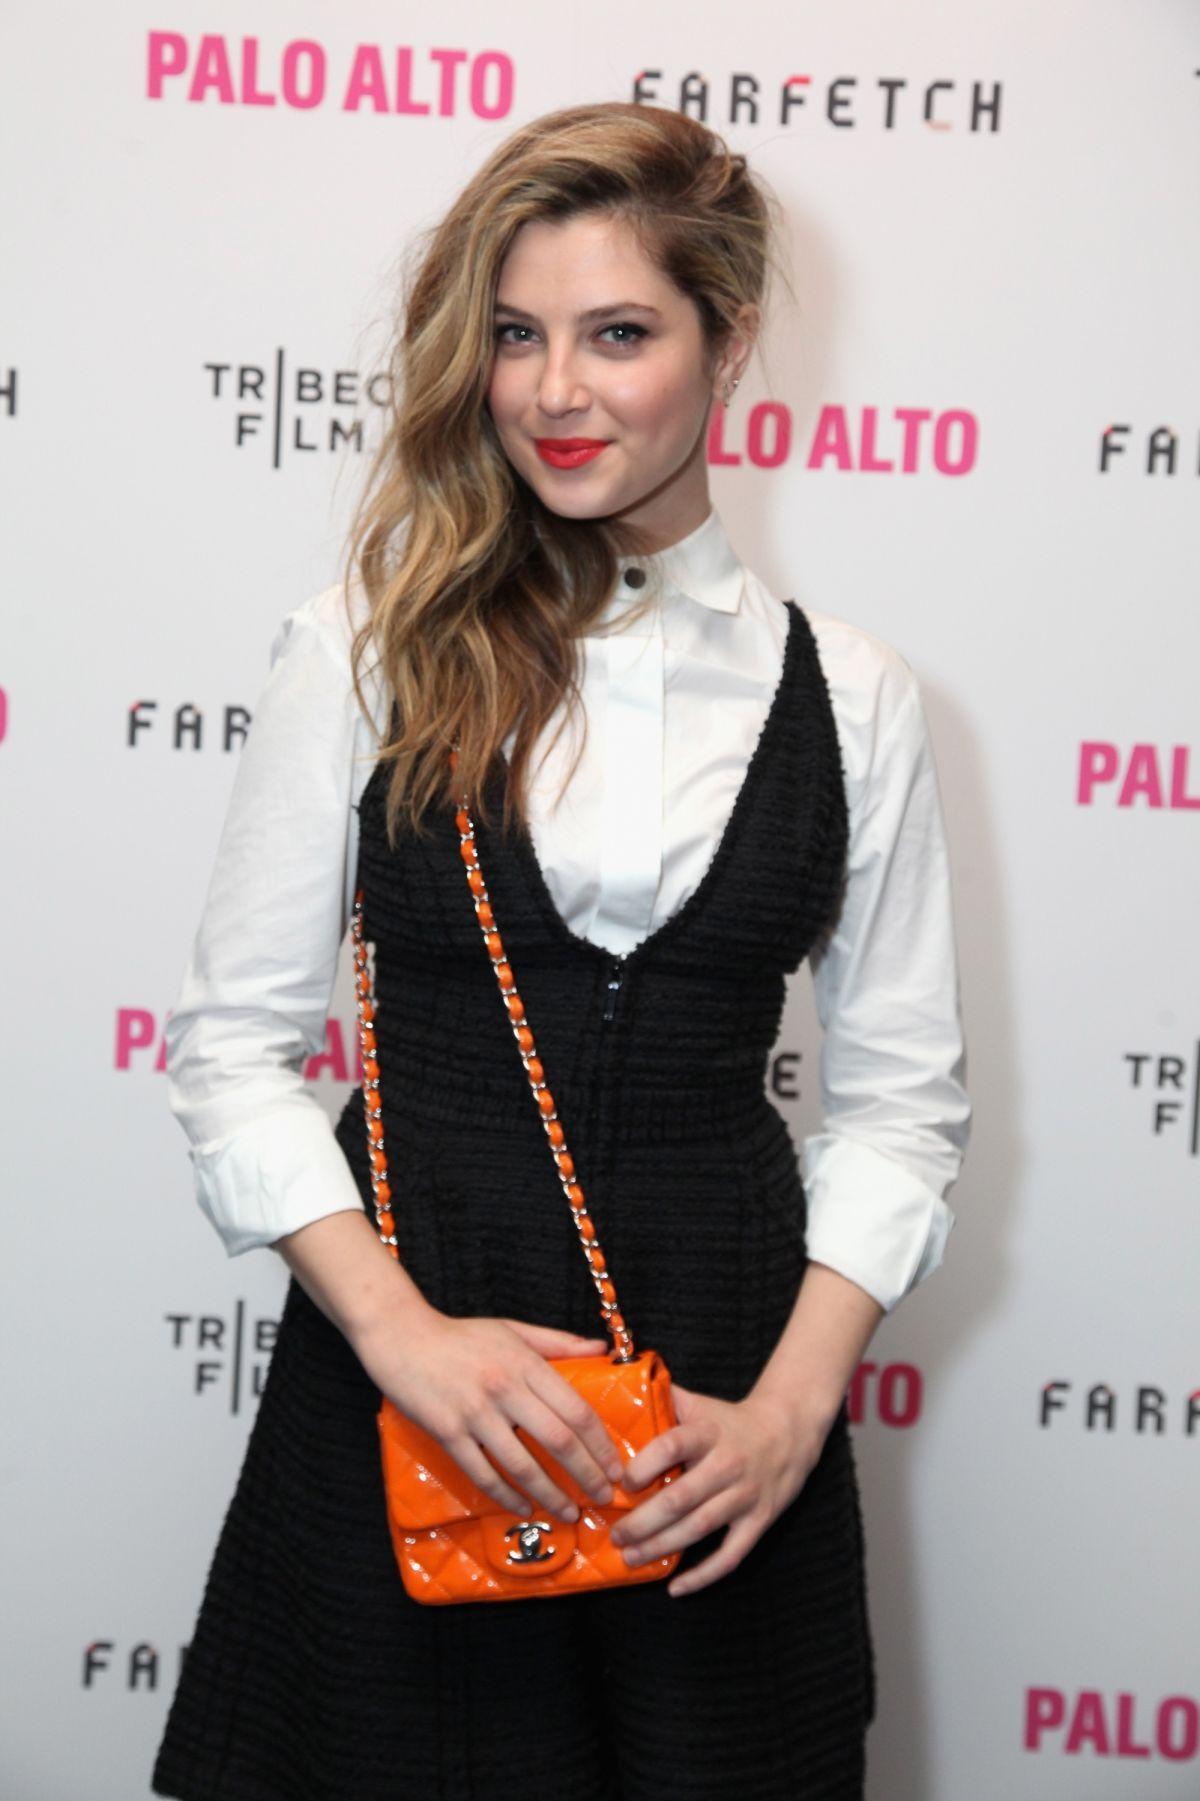 Zoe levin at palo alto premiere at tribeca film festival actresses